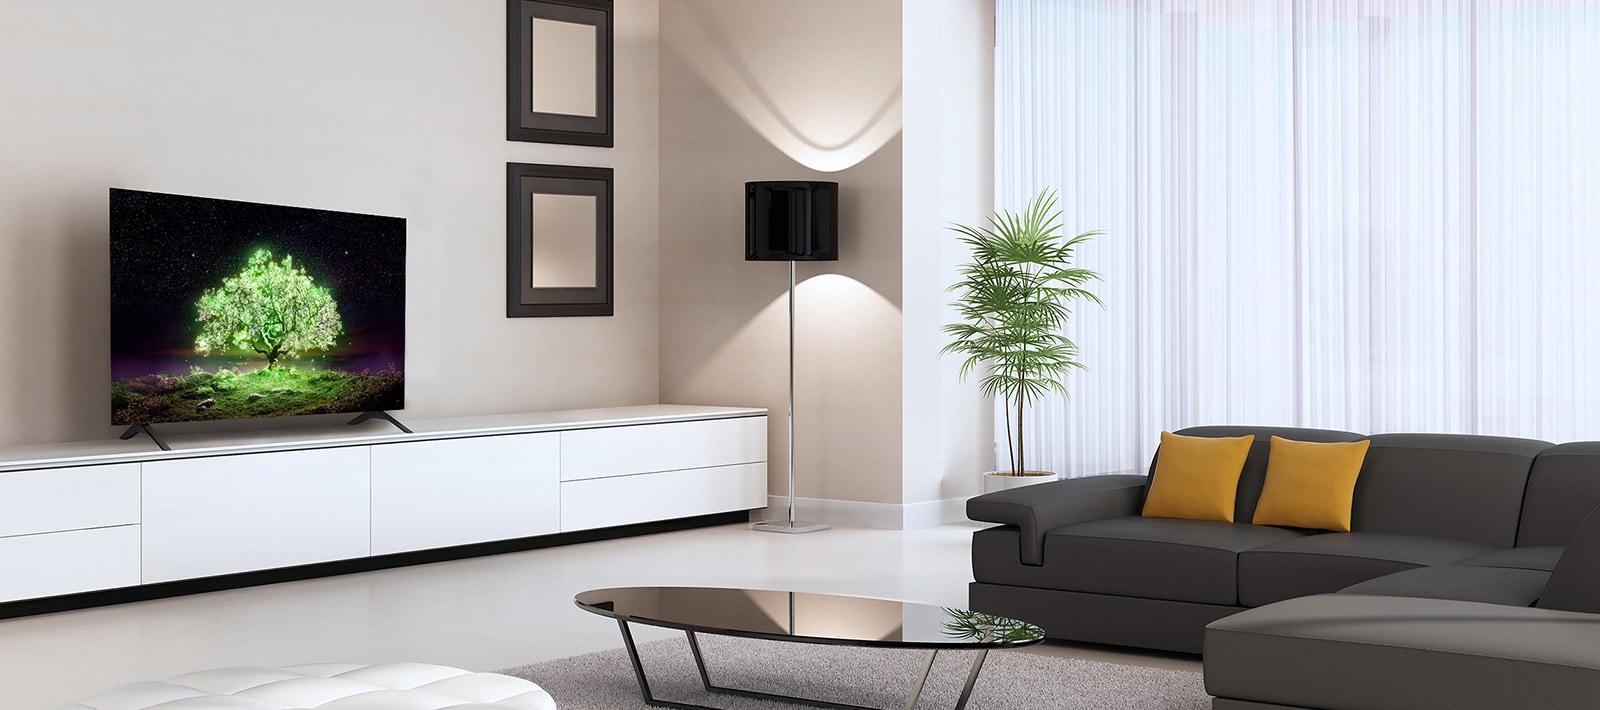 OLED Design. Exquisite  proportions